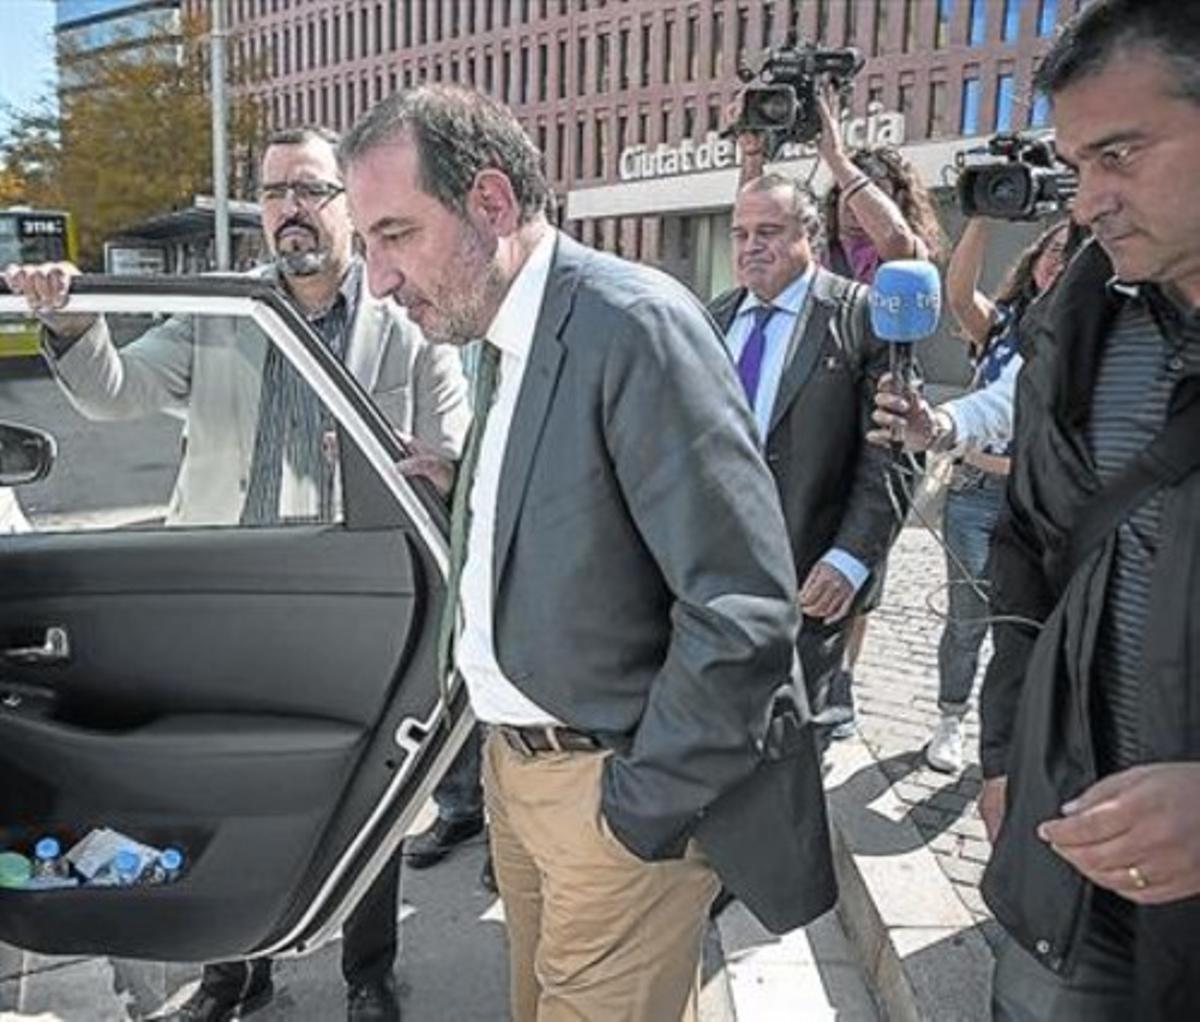 DECLARACIÓN JUDICIALRamon Espadaler, a su salida de la Ciutat de la Justícia, donde declaró ayer sobre la fortuna de Jordi Pujol Ferrusola.